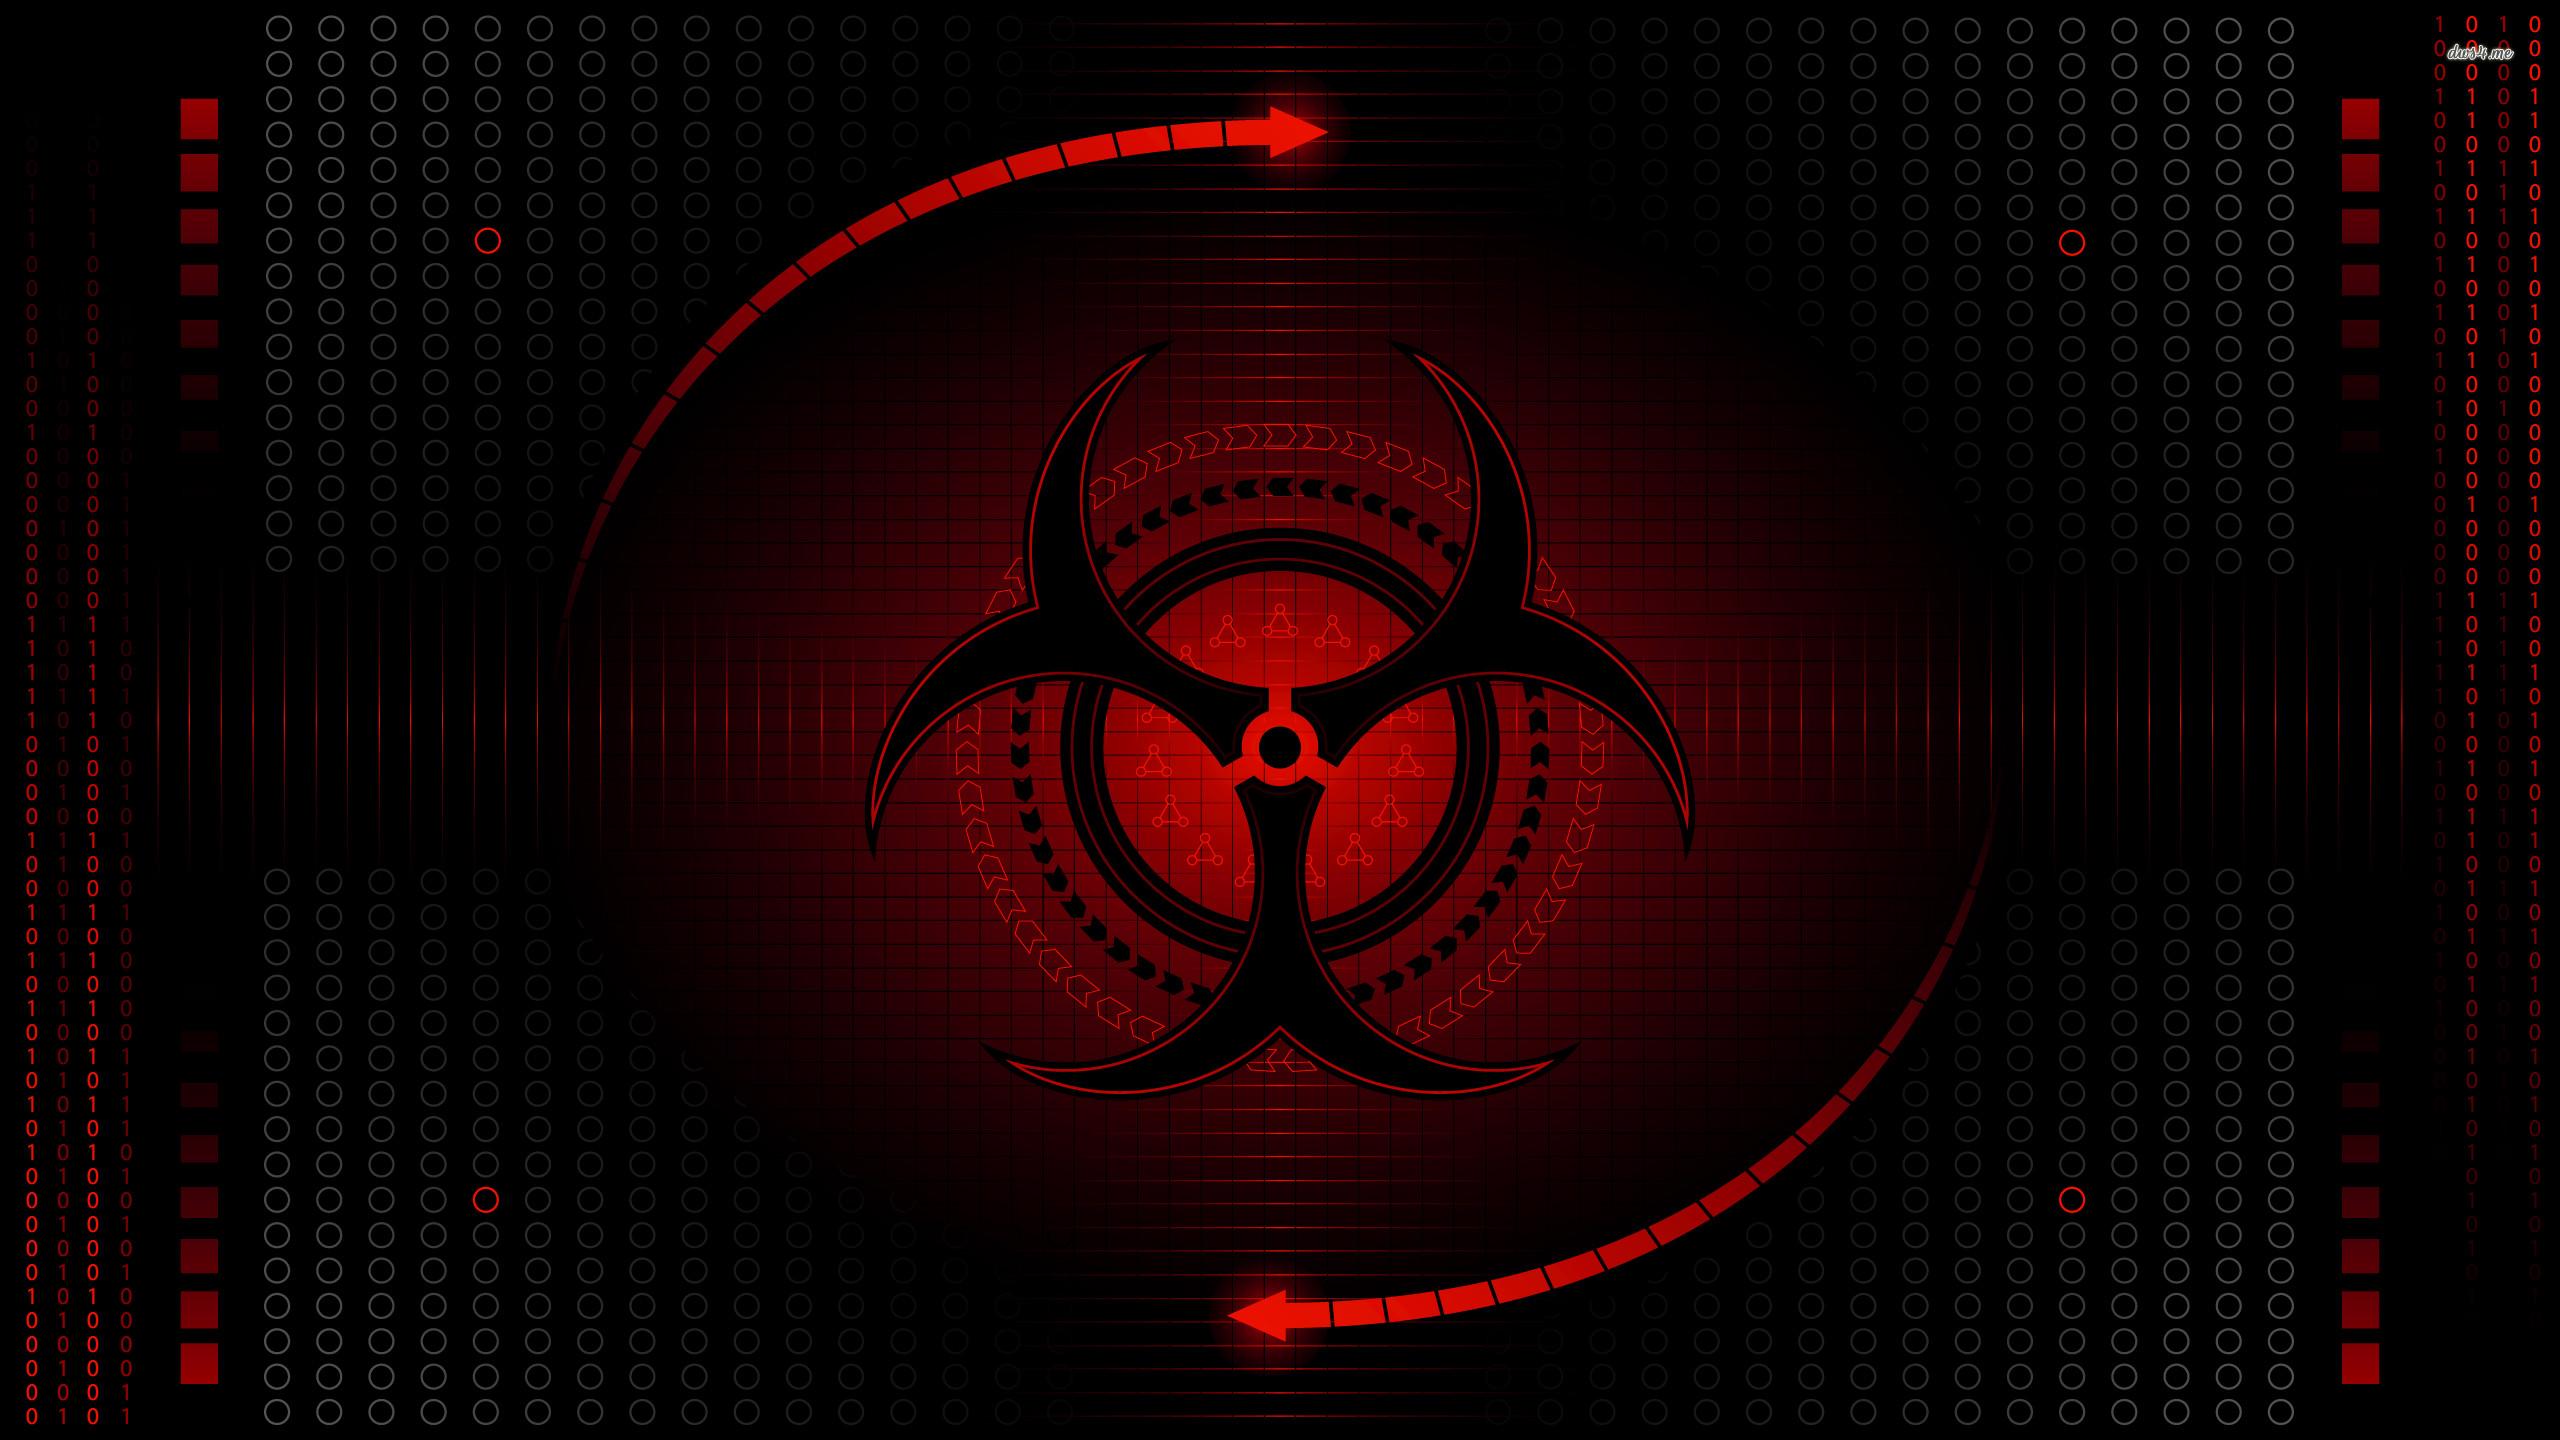 Biohazard symbol wallpaper bbiohazardb voltagebd Gallery